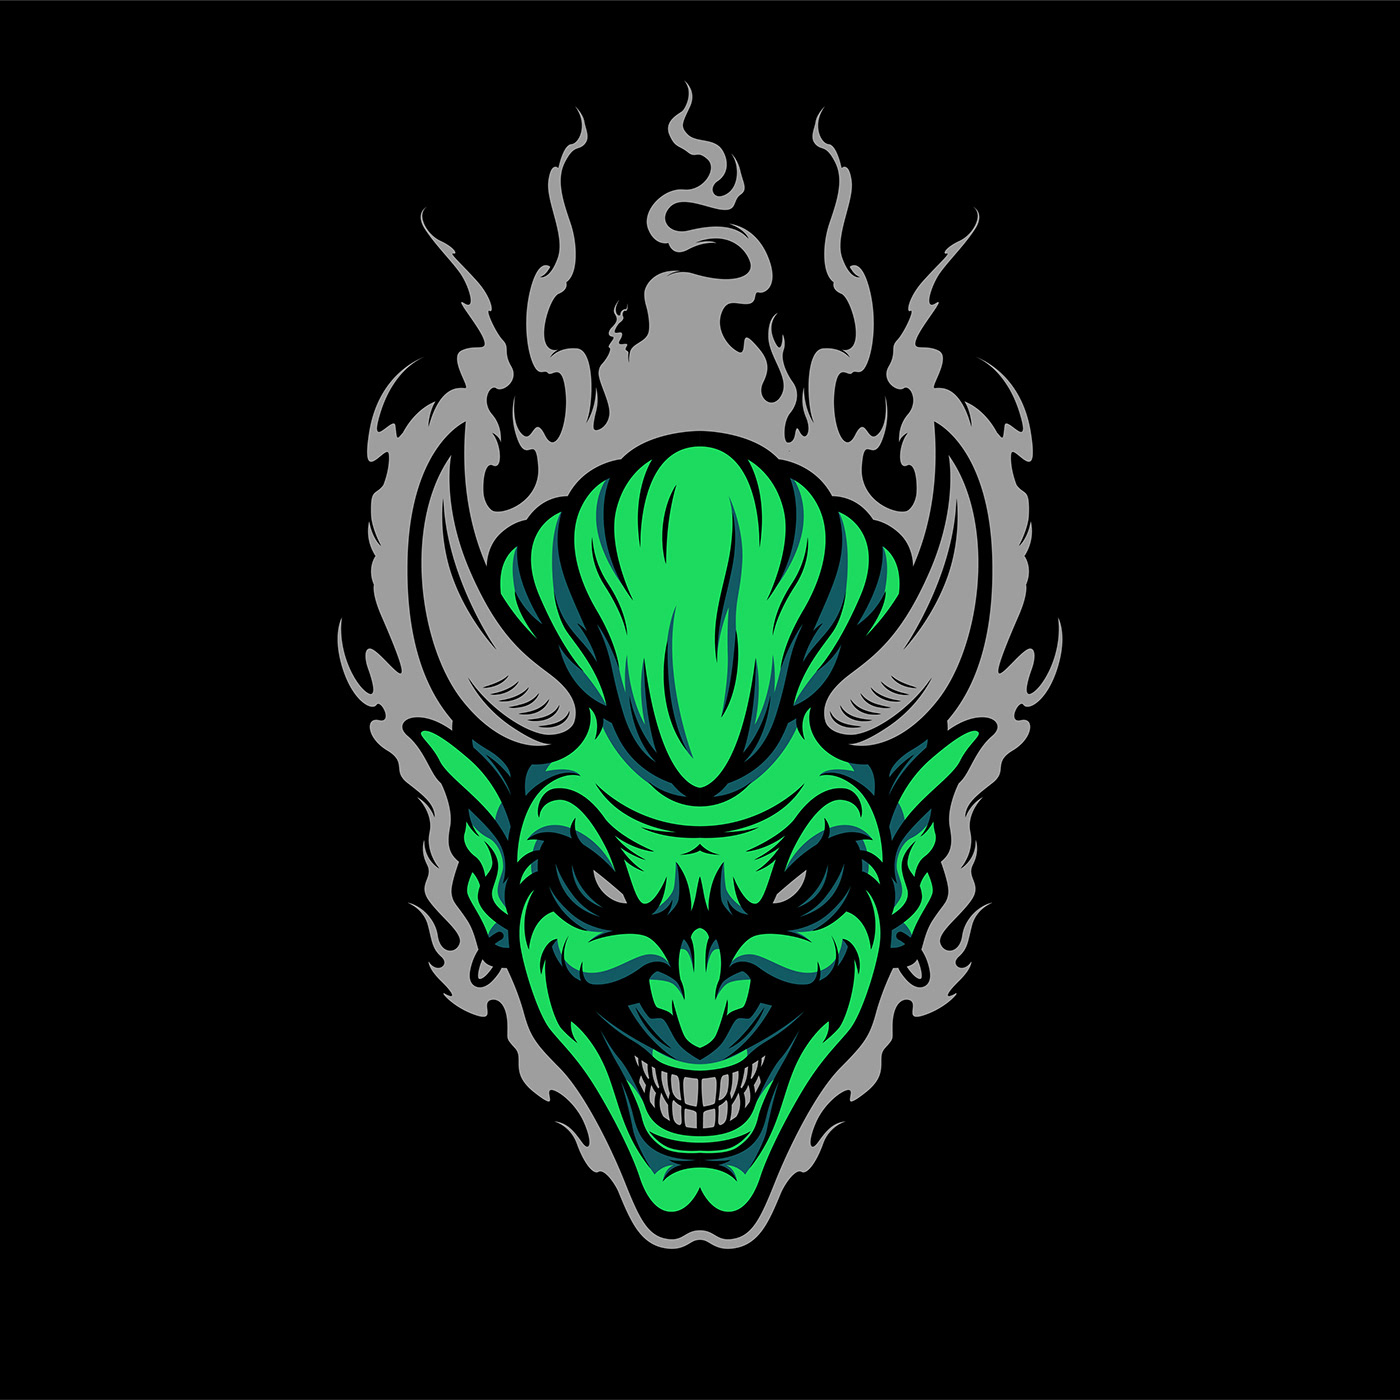 devil logo on behance devil logo on behance